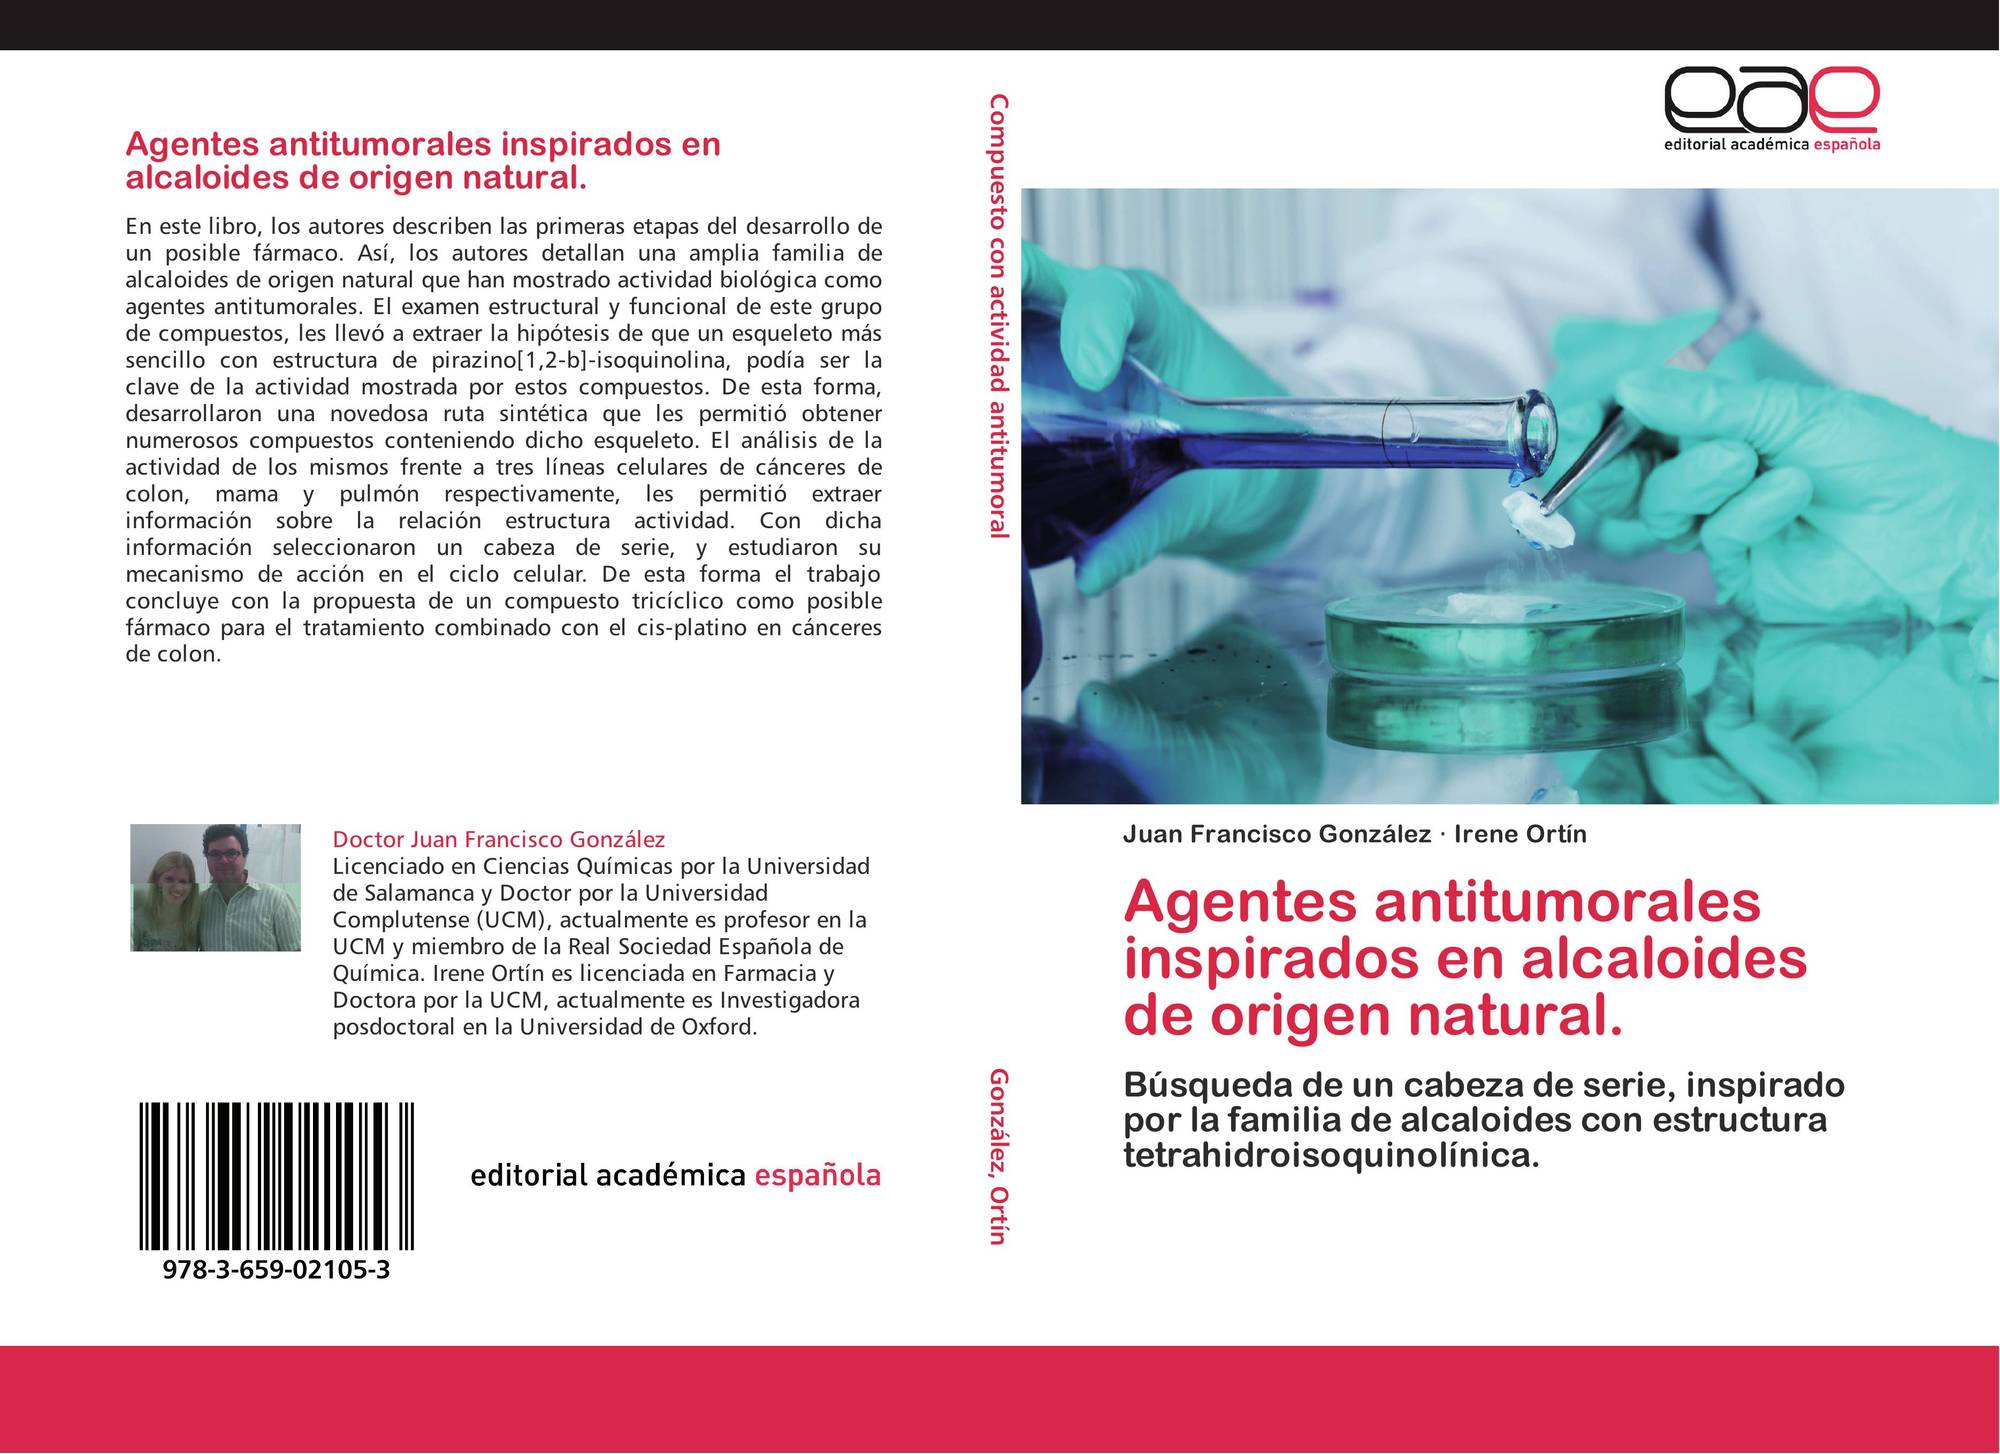 Agentes Antitumorales Inspirados En Alcaloides De Origen